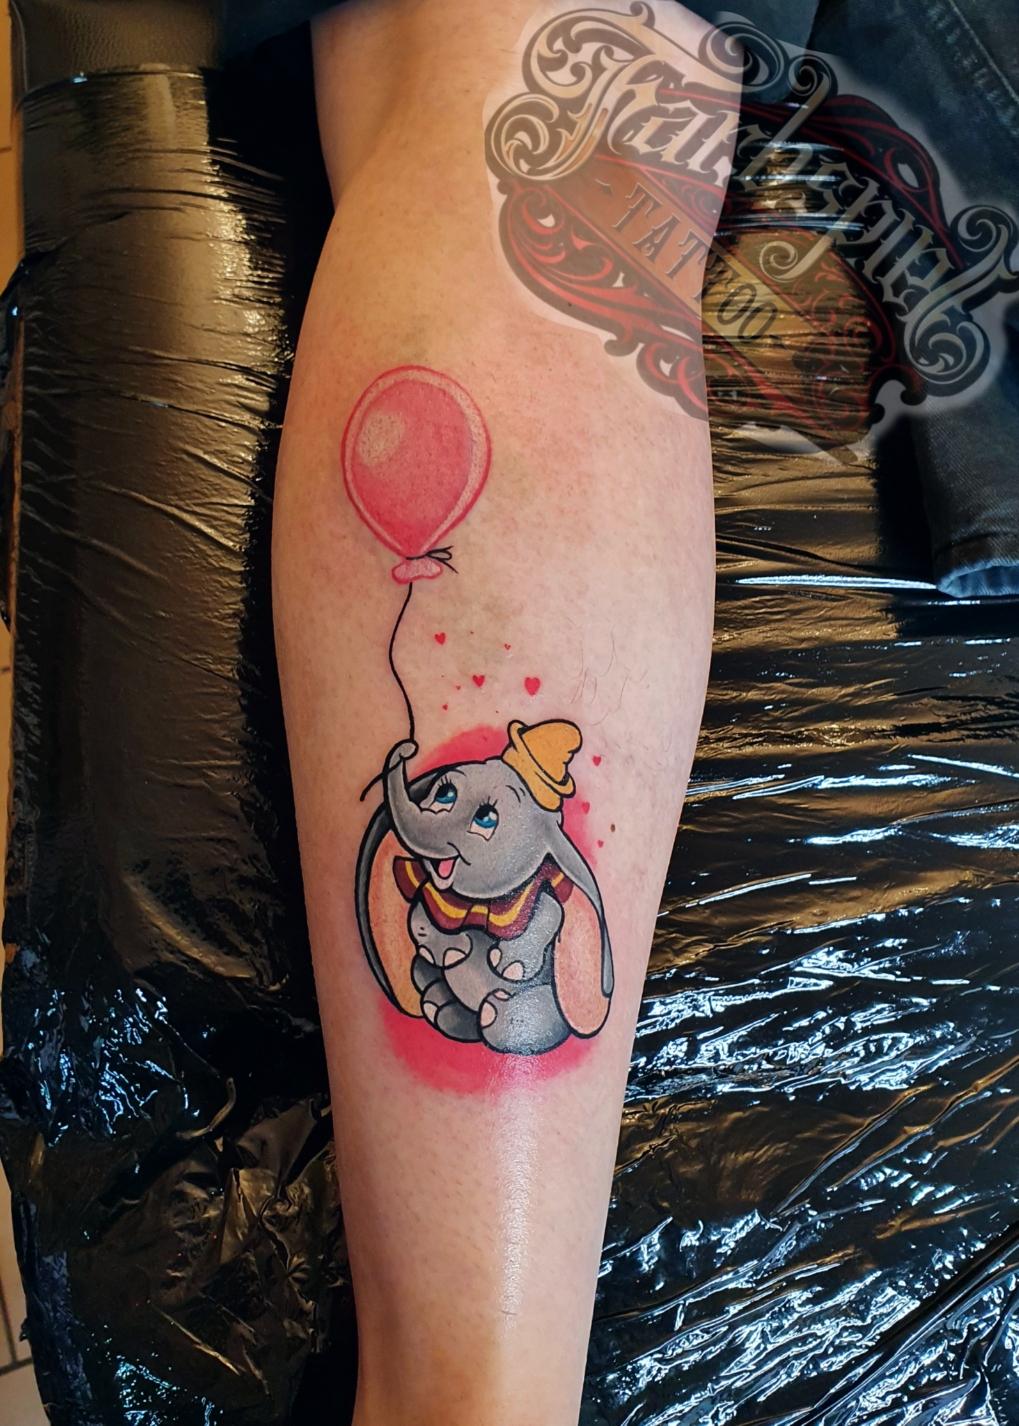 #Disneys #dumbo #tattoo #farbspieltattoo